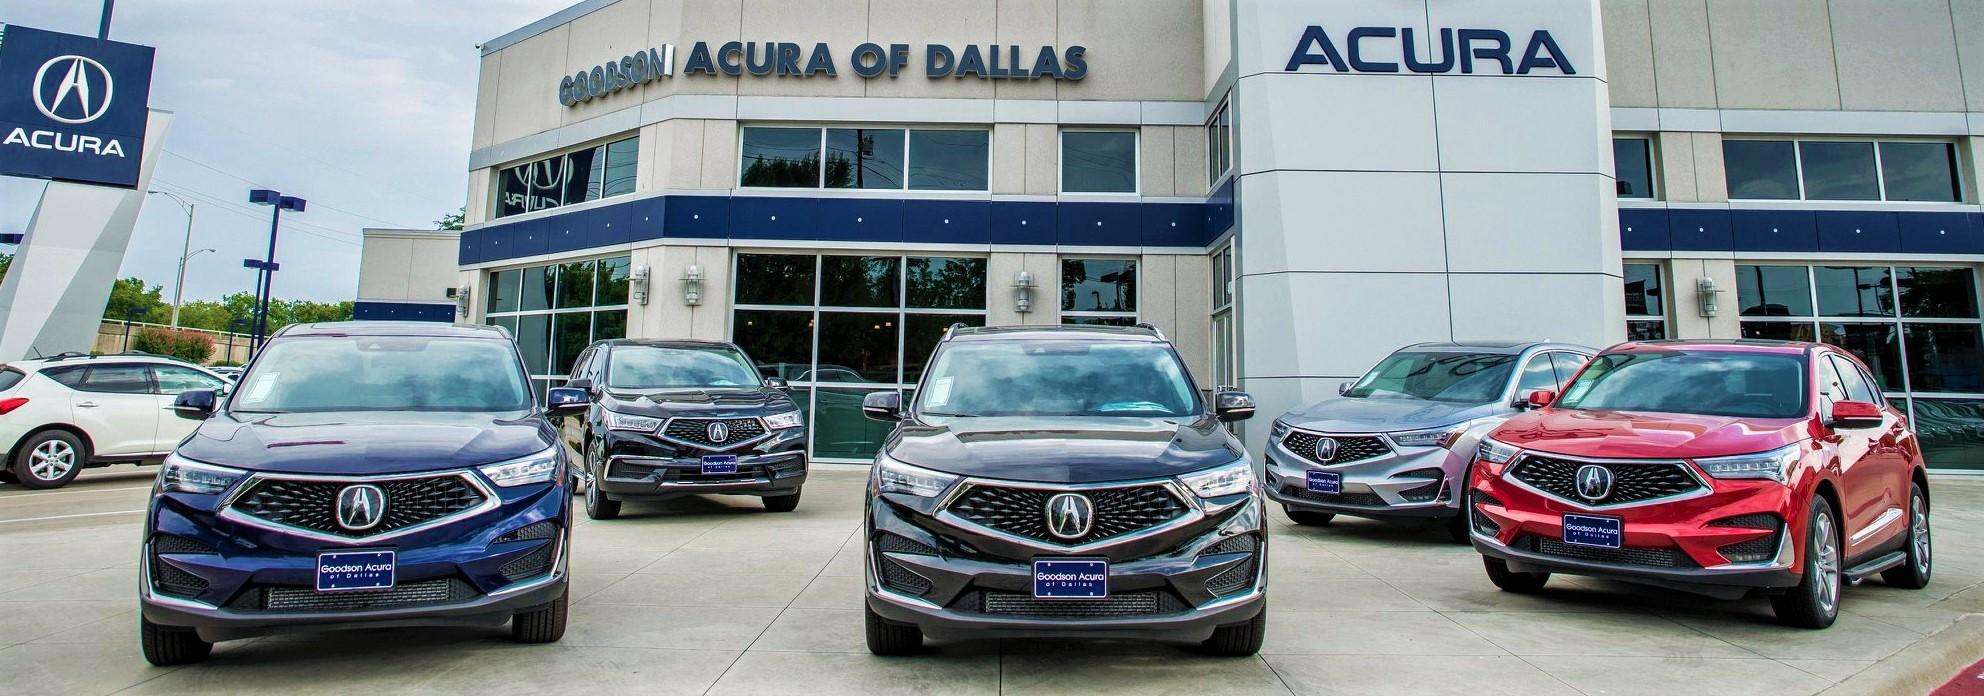 Goodson Acura Of Dallas New Acura Dealership In Dallas TX - Acura care extended warranty